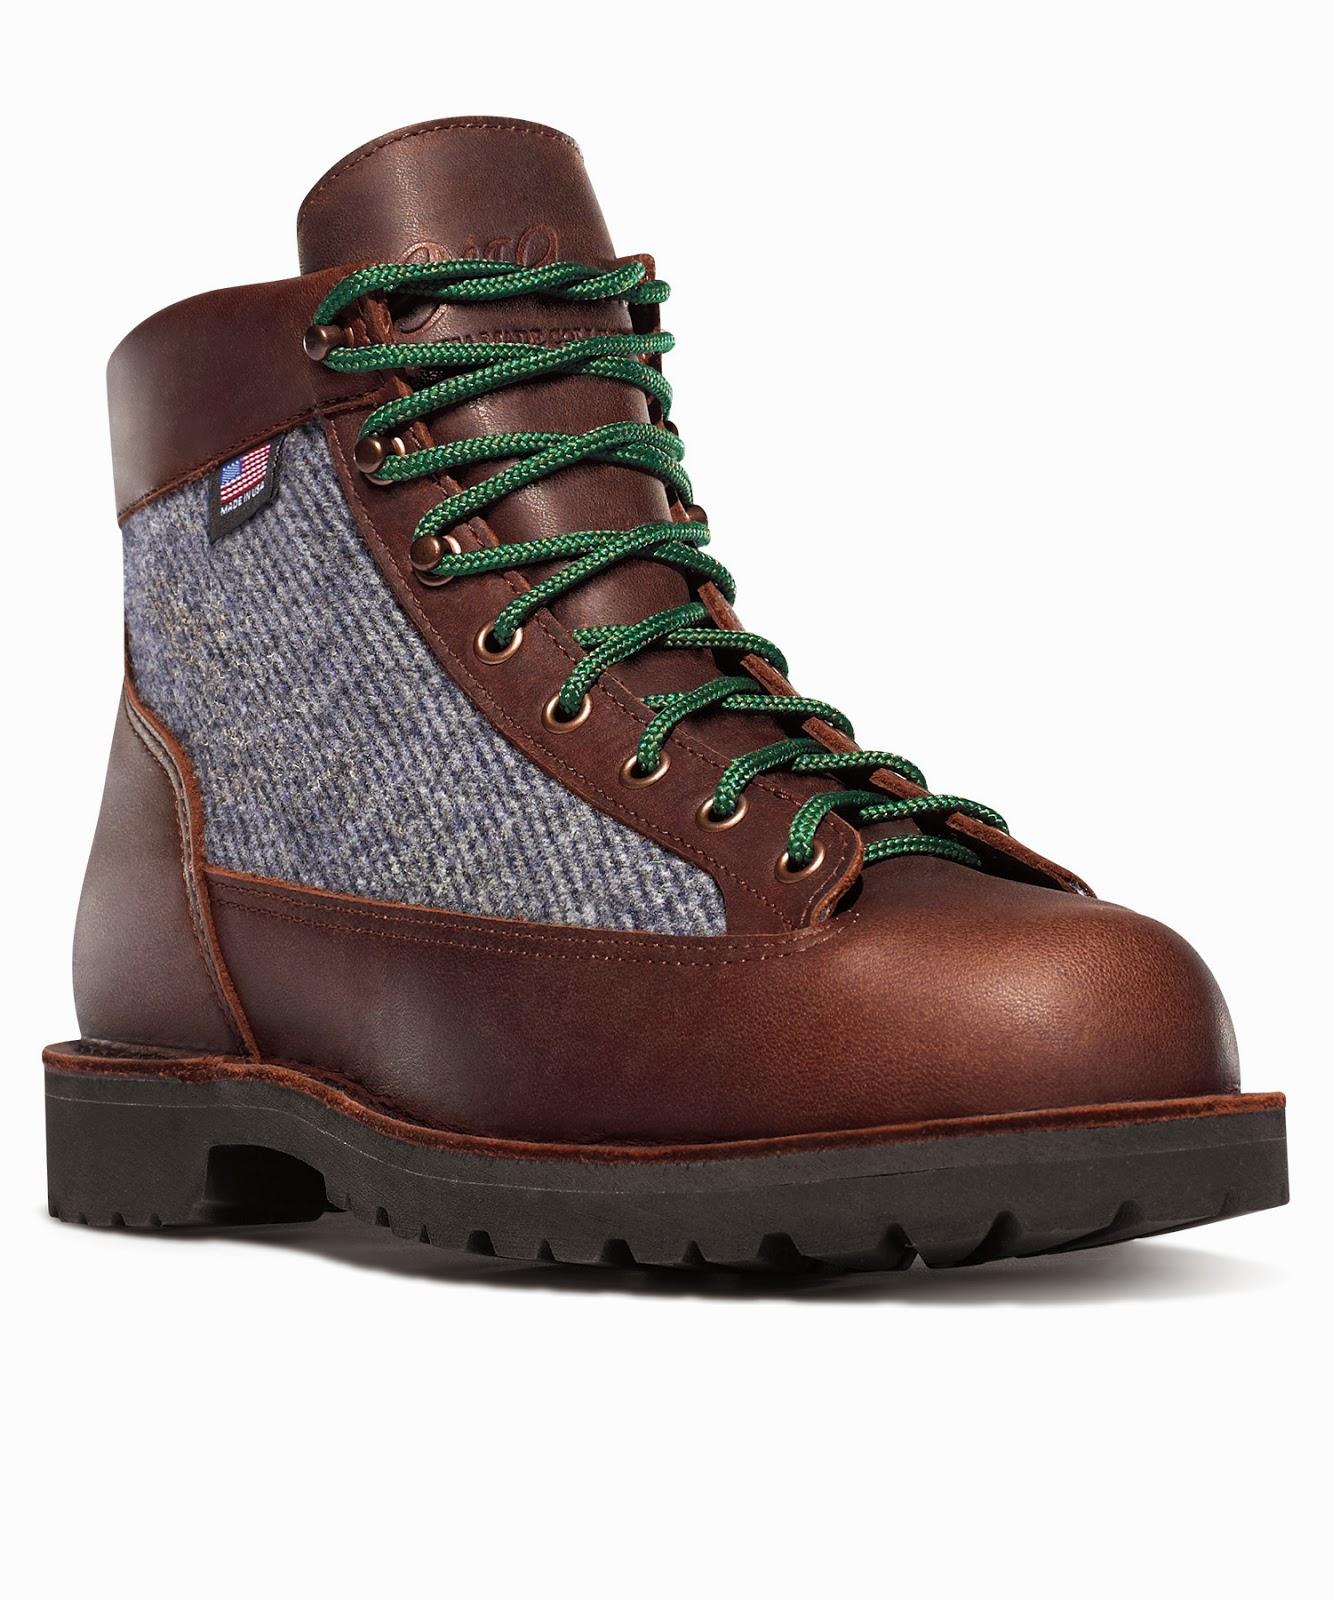 Woolrich X Danner Mill Street Boots Staycrispymyfriends